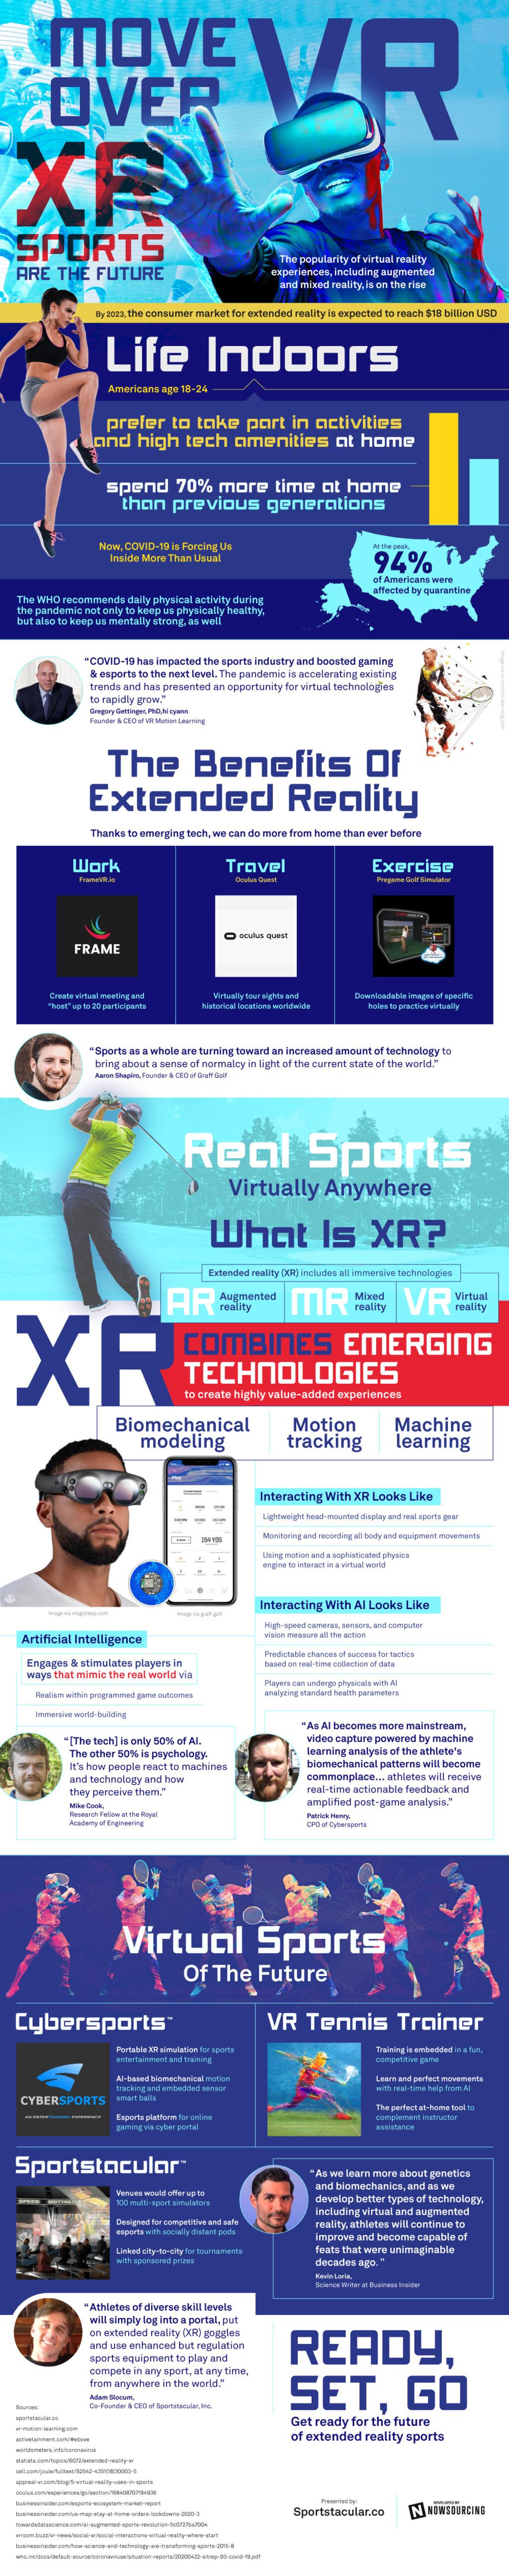 Competitive Virtual Sports via Brian Wallace